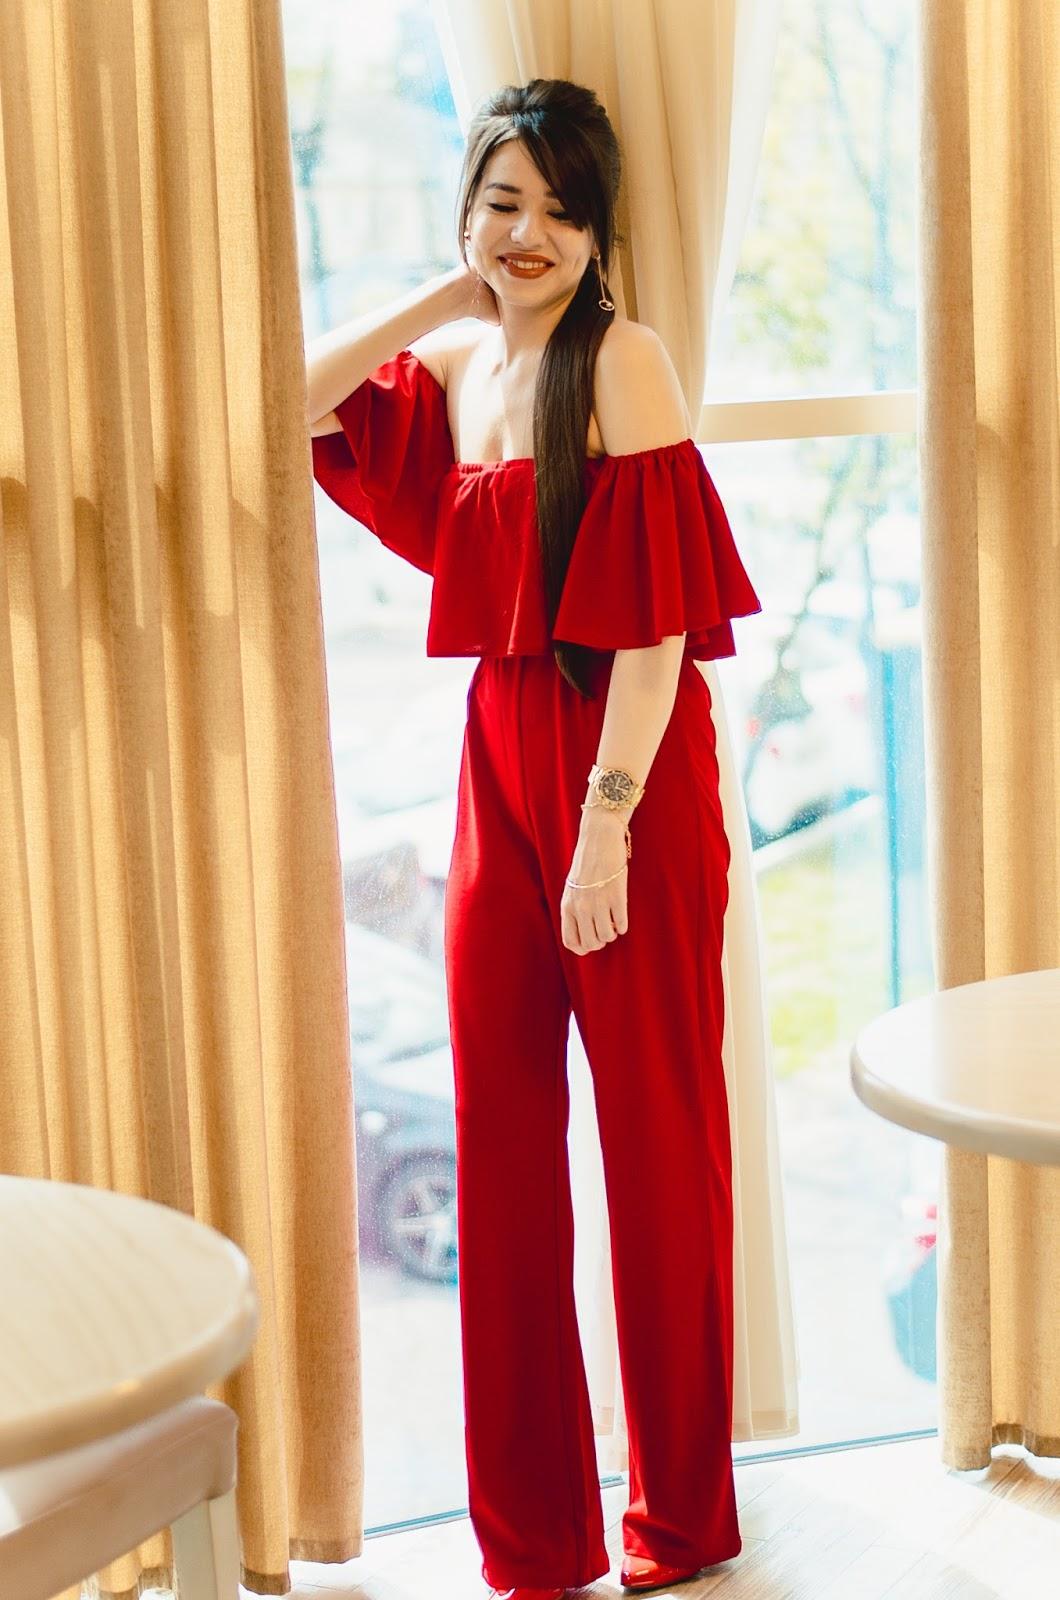 fashion blogger diyorasnotesdiyora beta red jumpsuit red heels